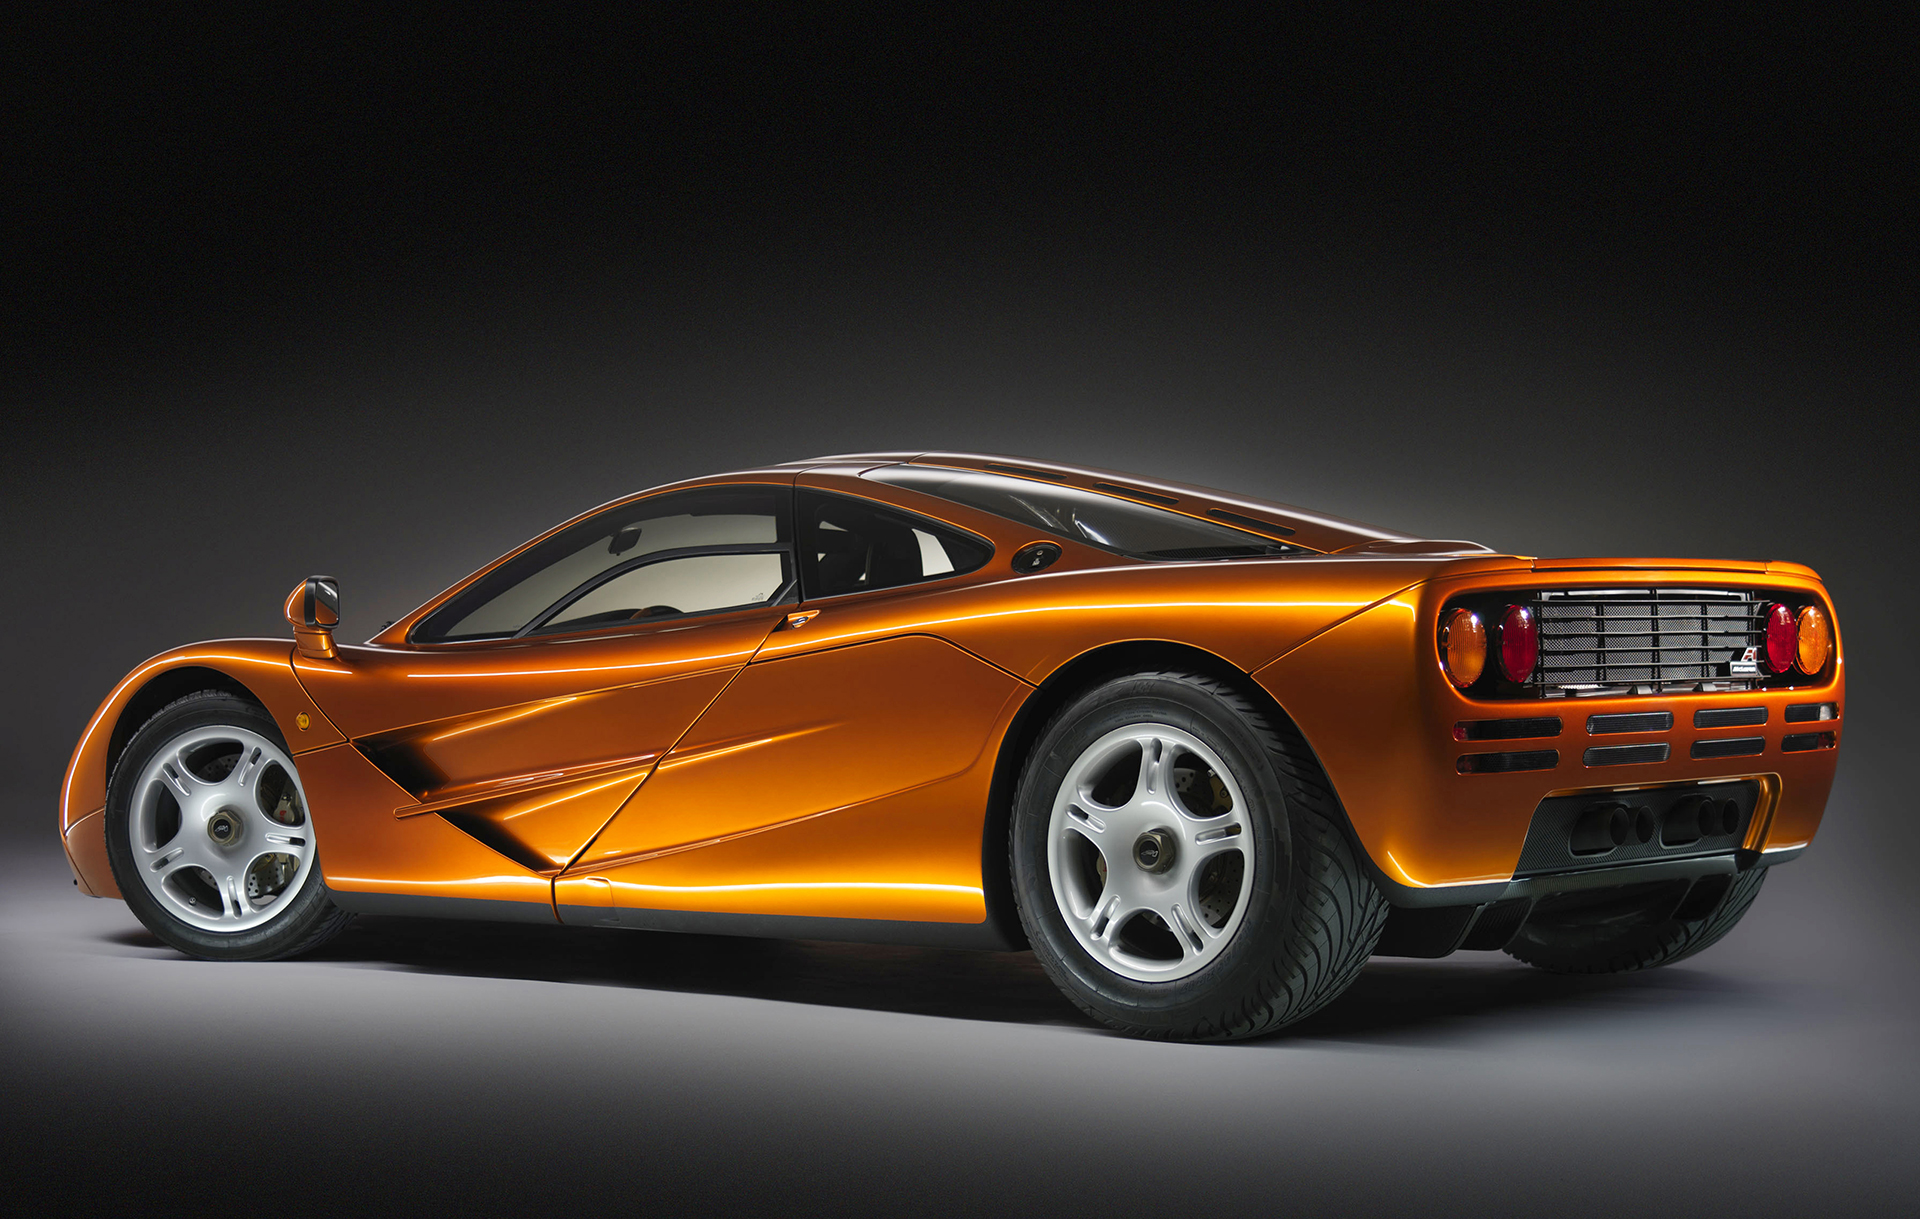 McLaren F1 - rear side-face  / profil arrière